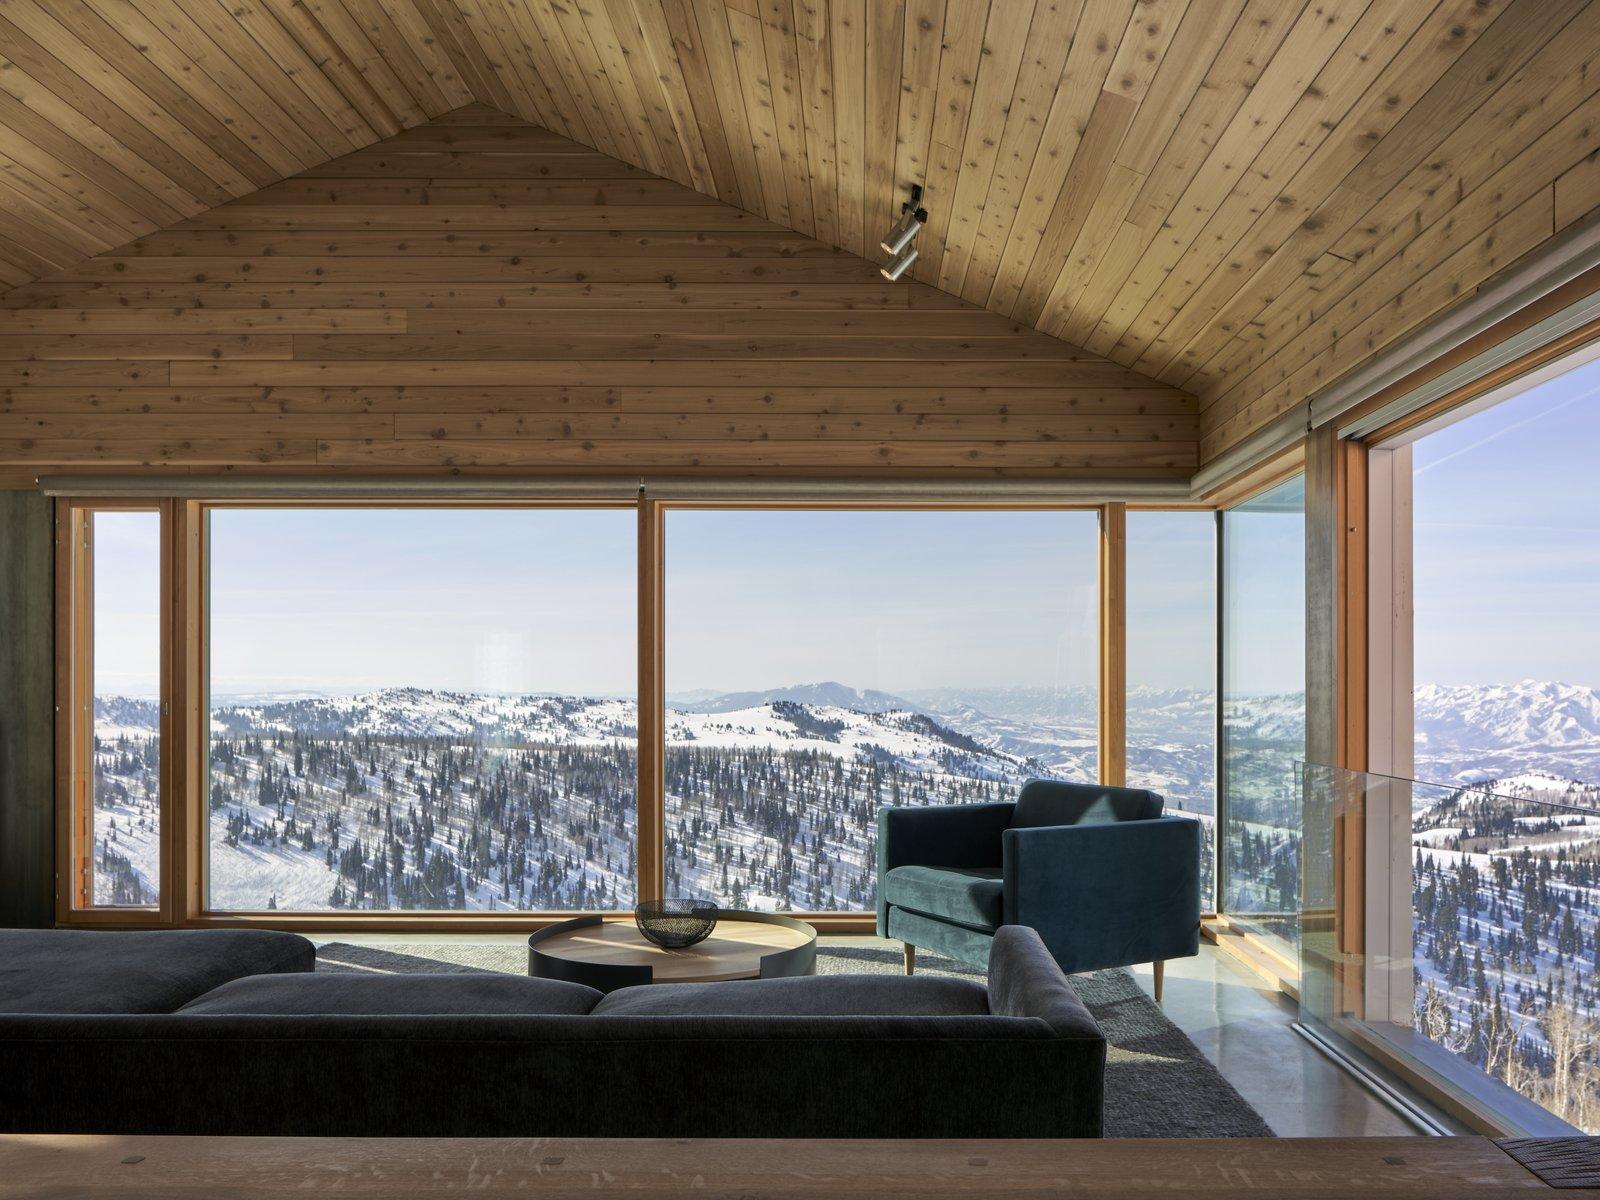 Horizon Neighborhood cabin interior